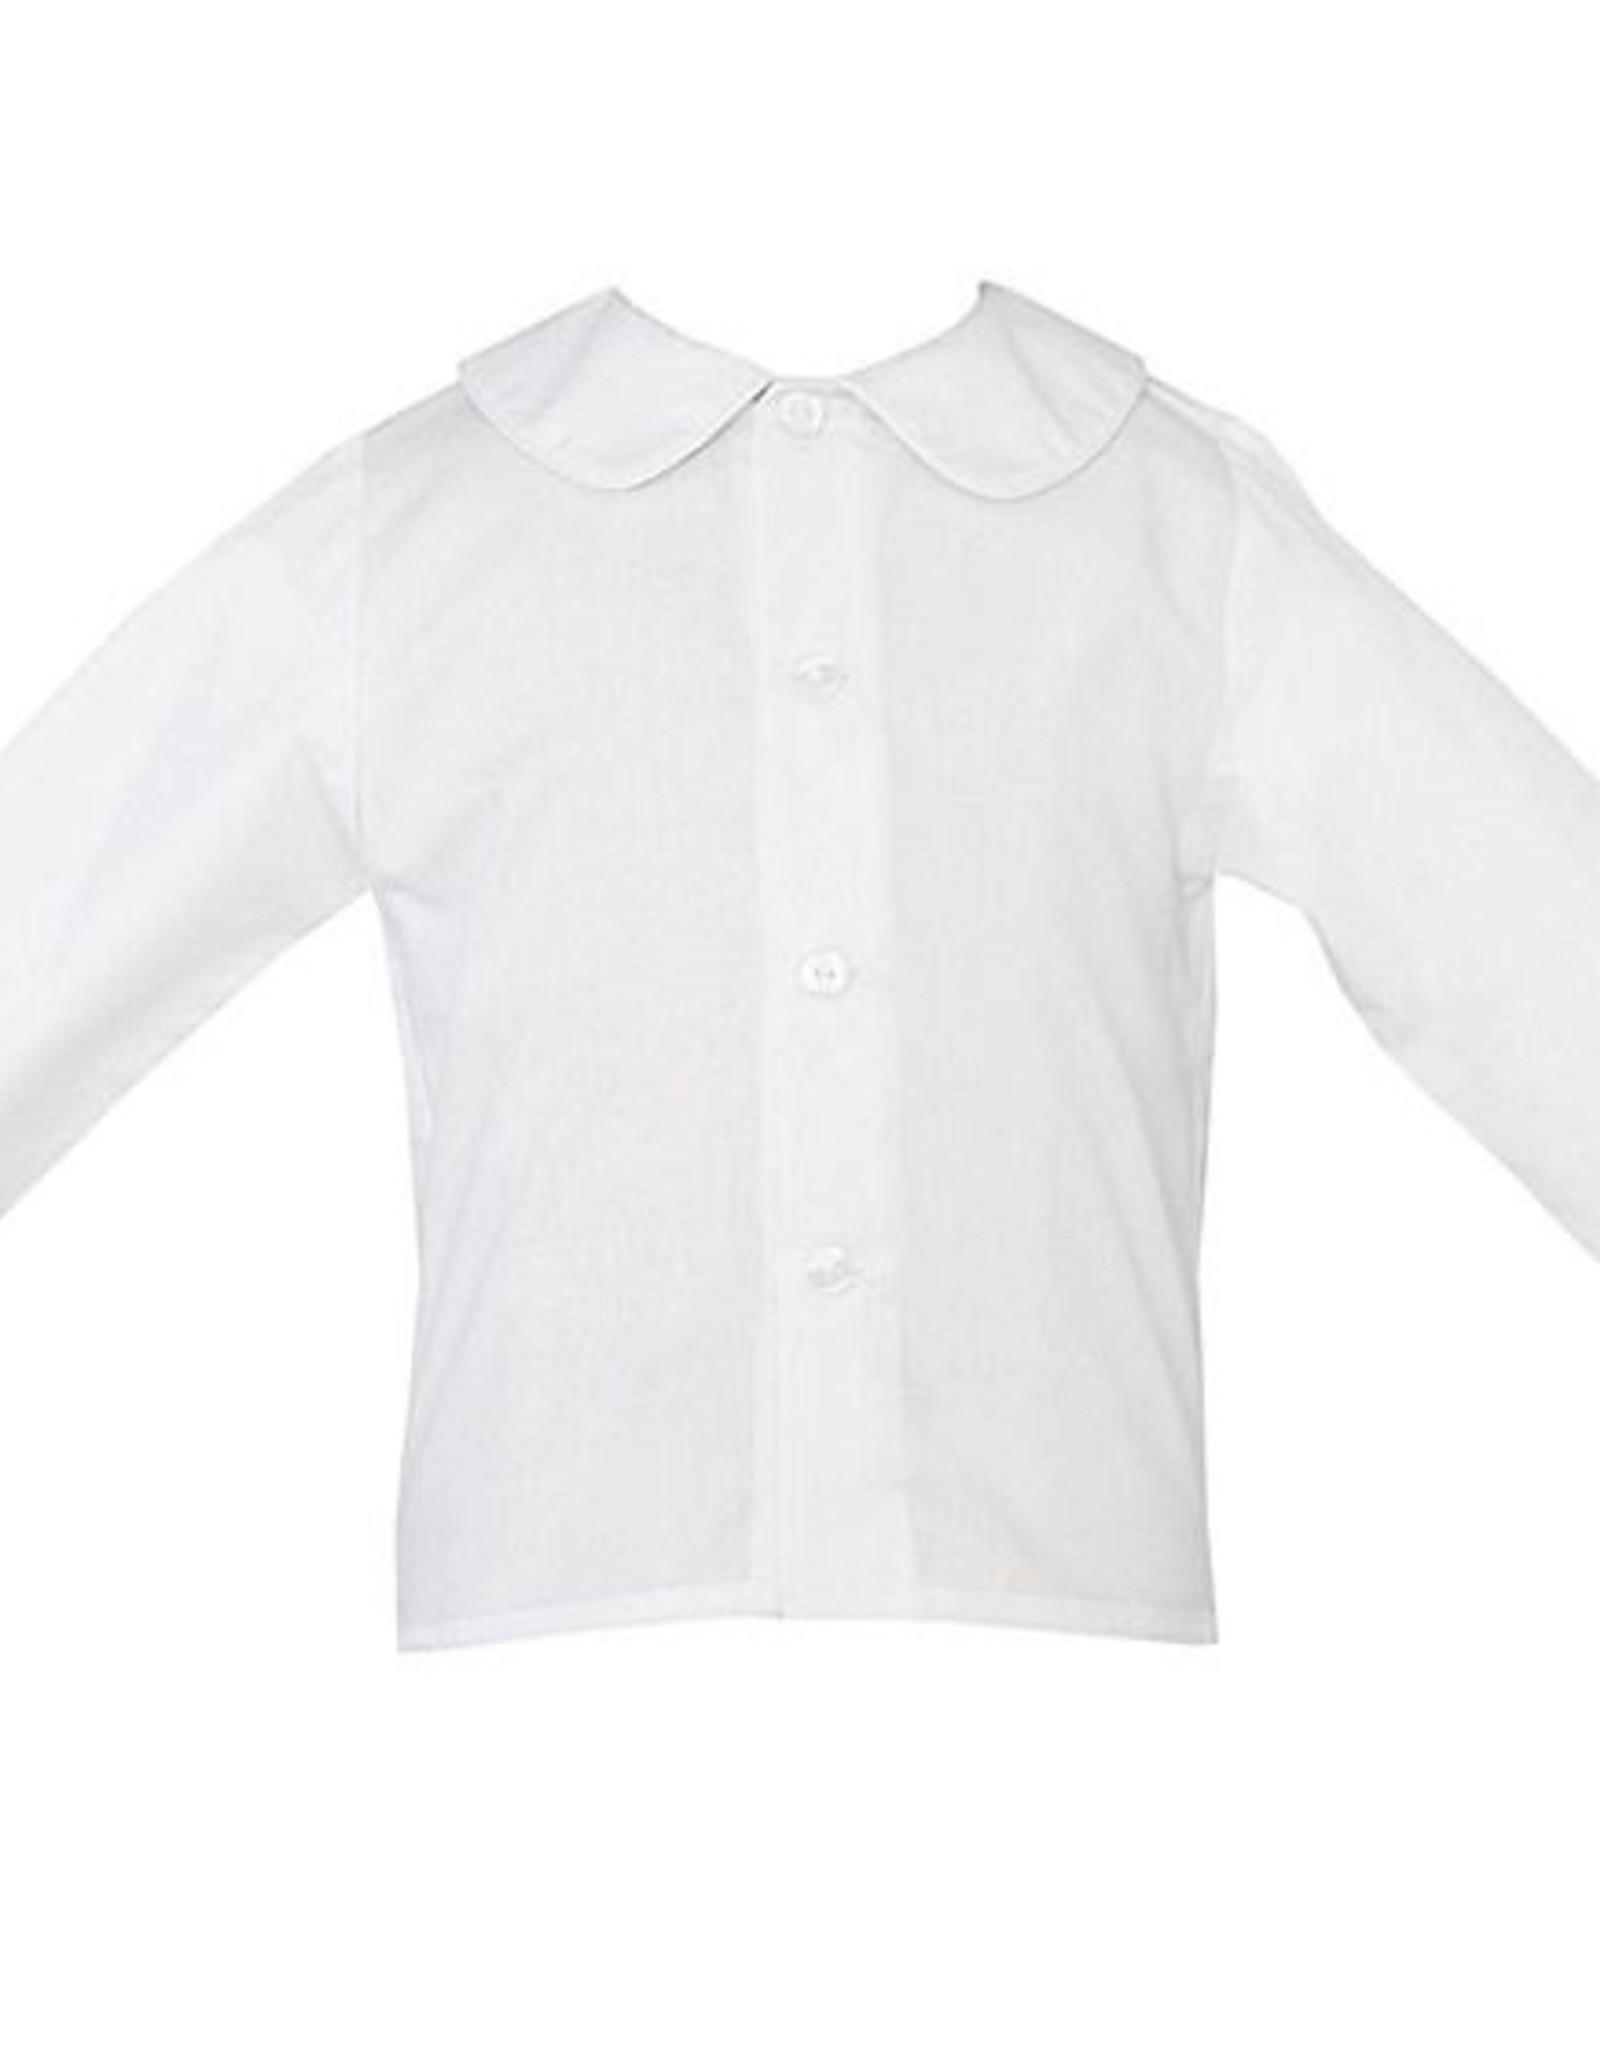 Petit Bebe Boys LS White Shirt w/ Buttons